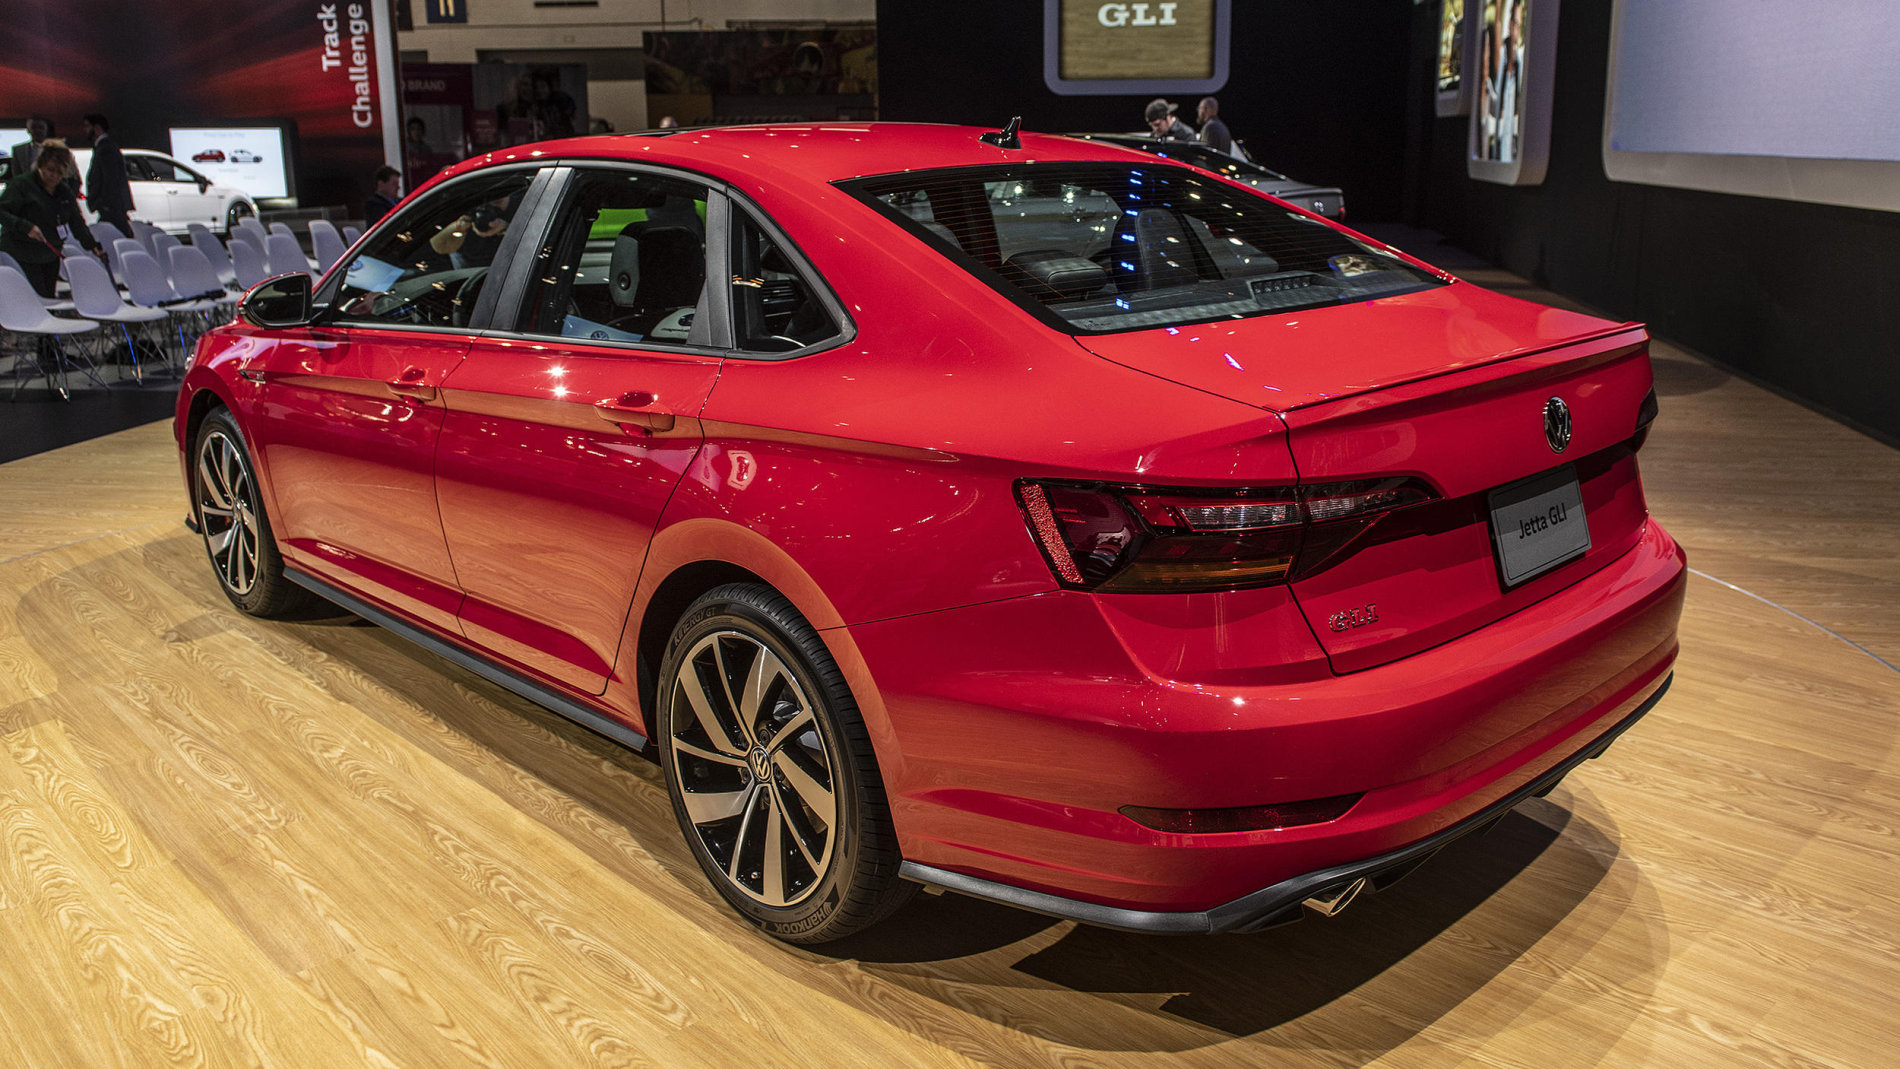 VW Jetta GLI - Poze Reale - VW Jetta GLI - Poze Reale